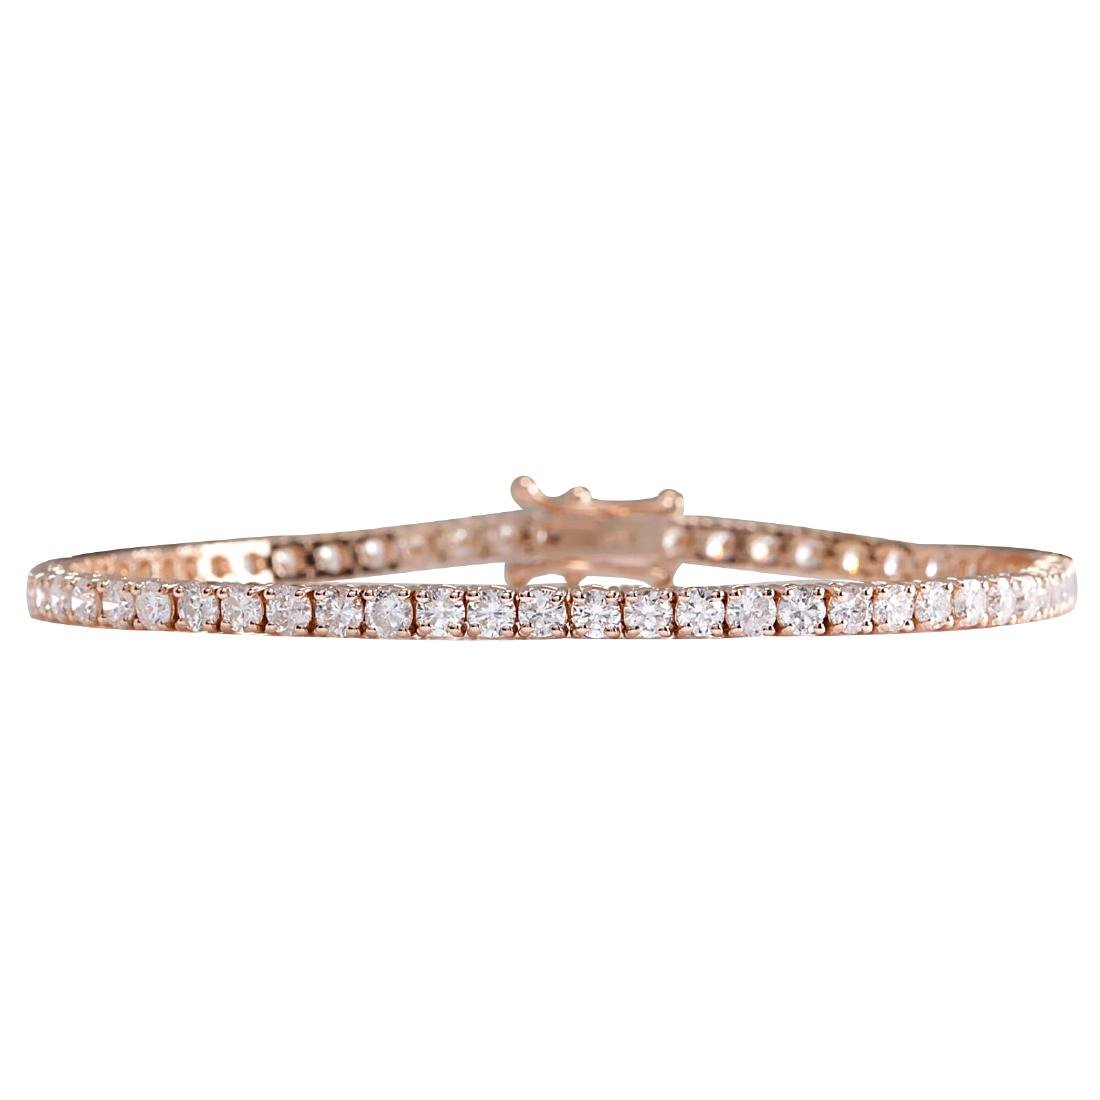 5.01CTW Natural Diamond Bracelet In 14K Rose Gold